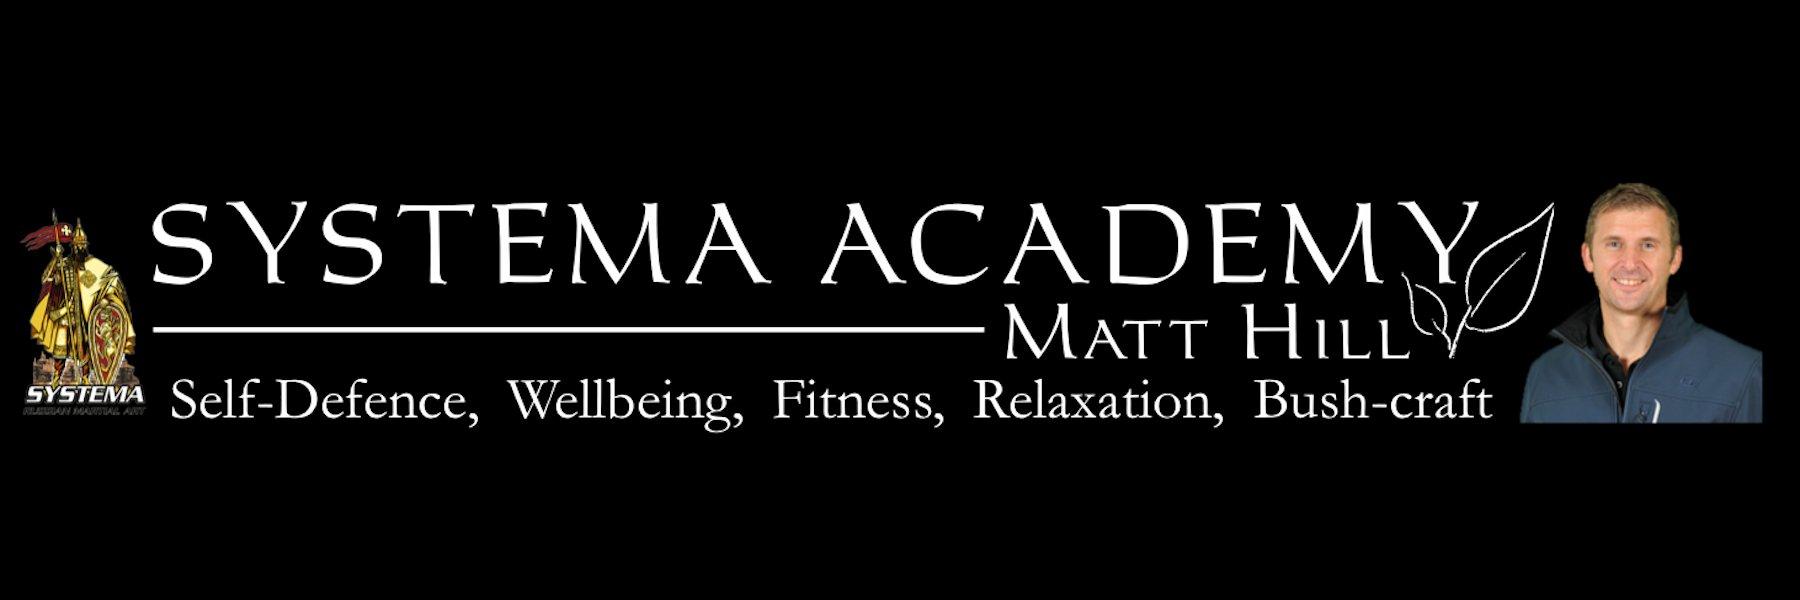 Systema Academy - Health and Self Defence Skills